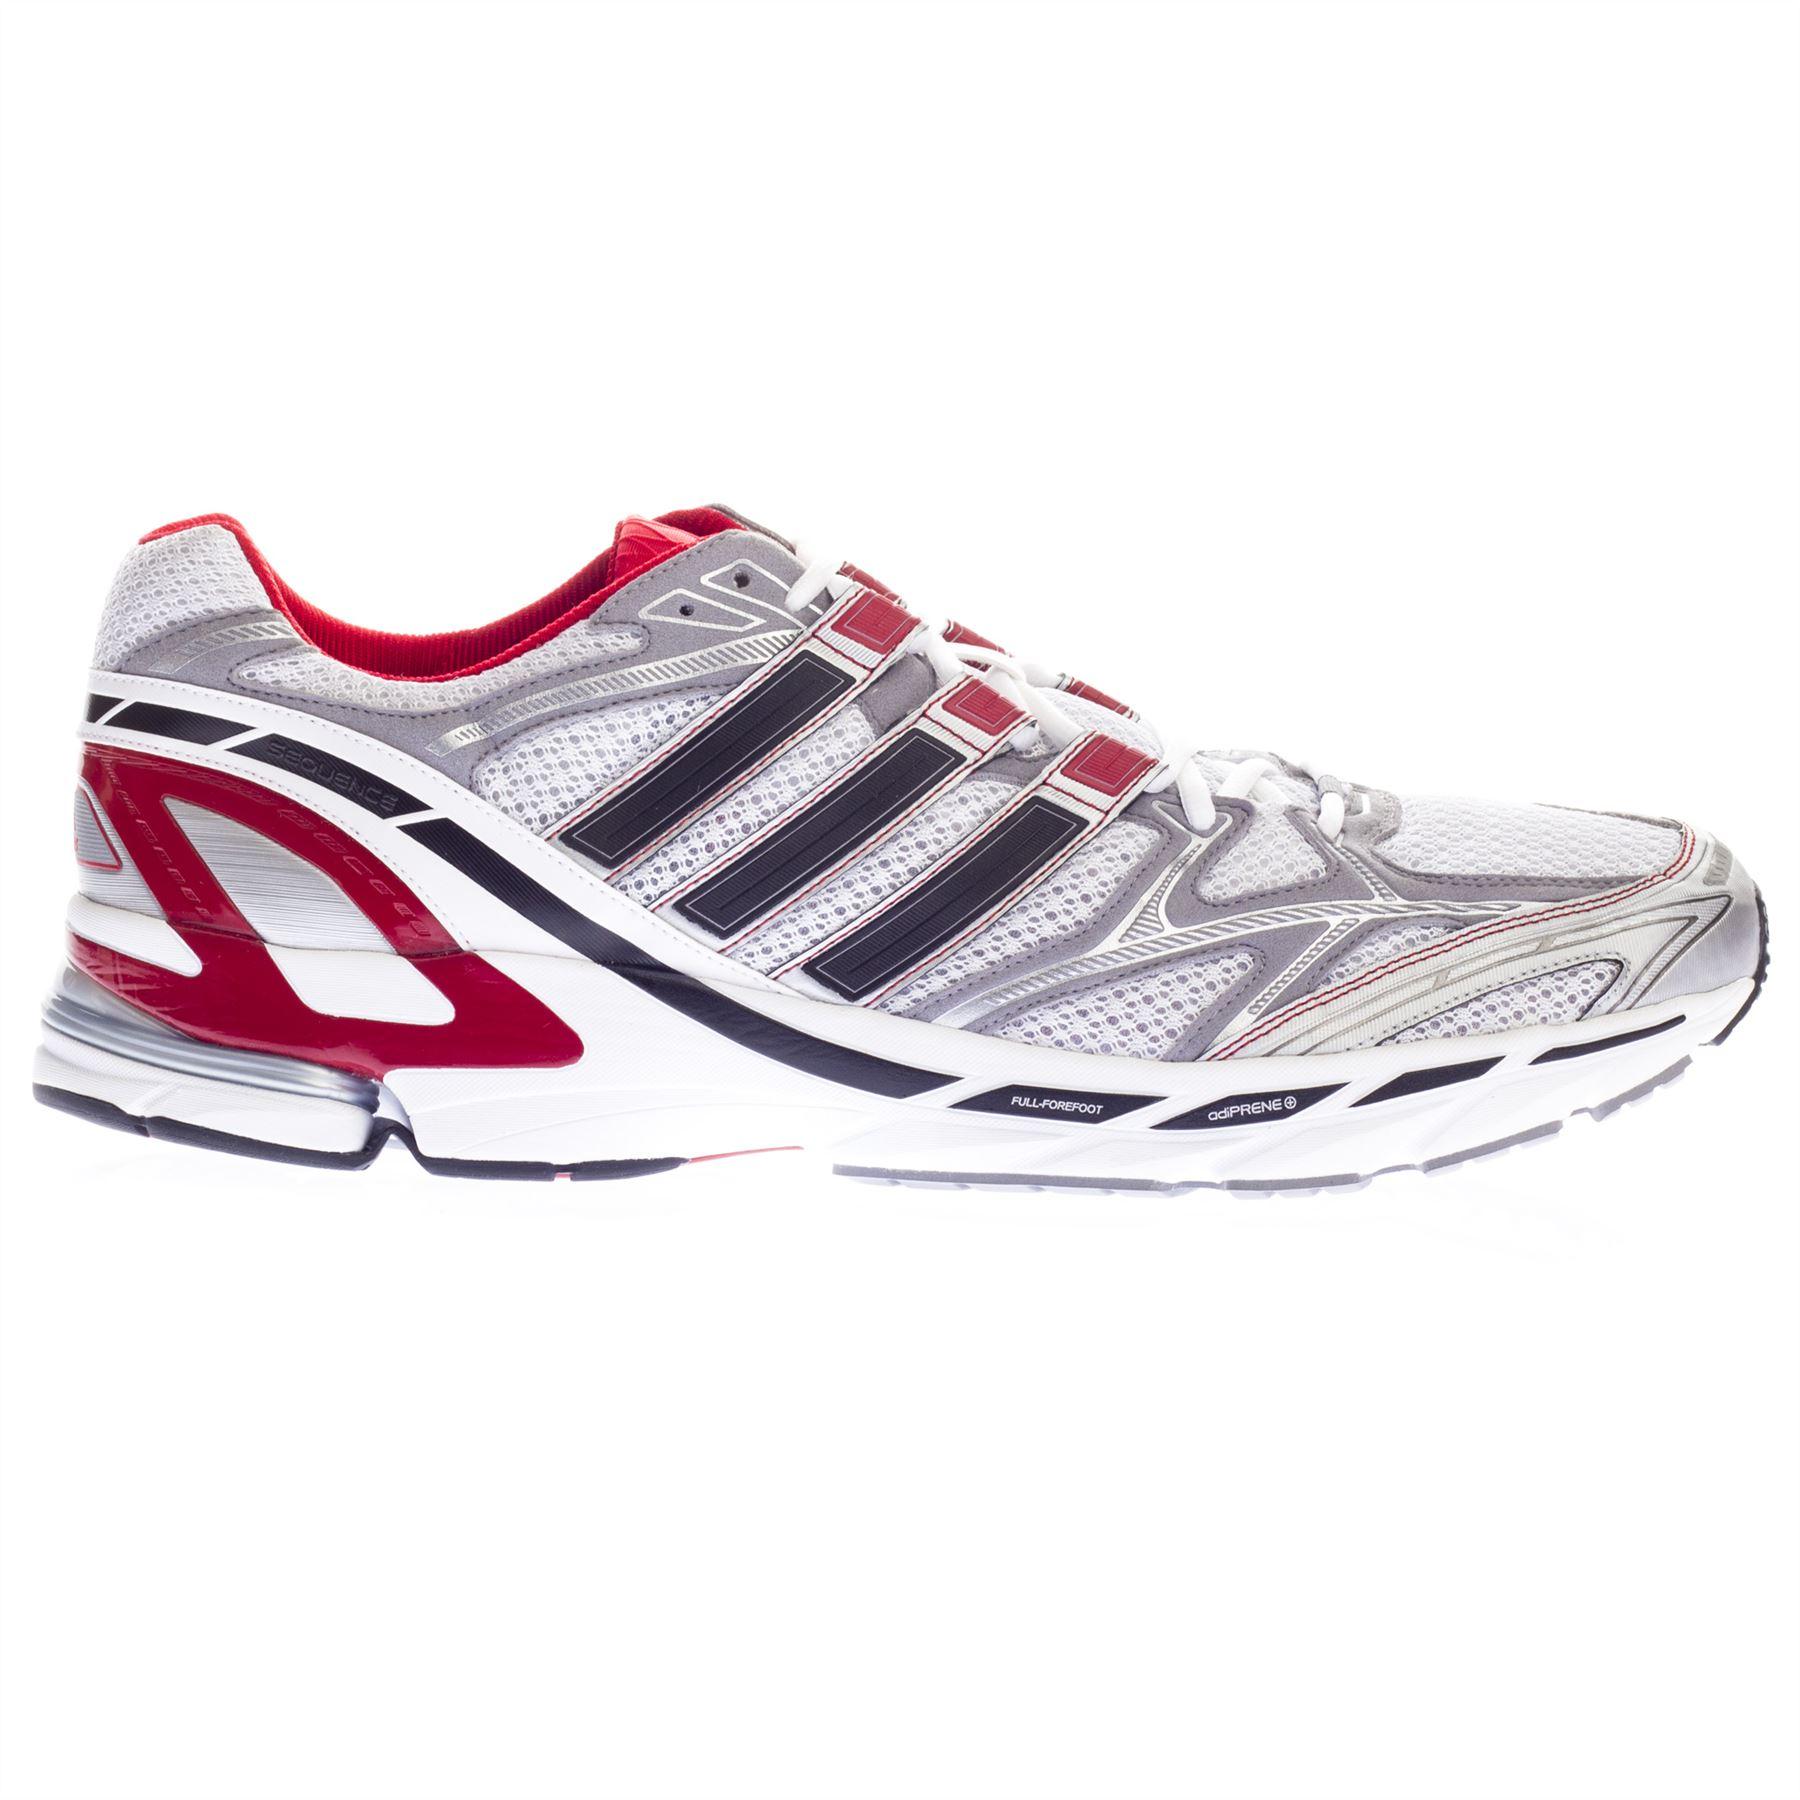 Adidas Diesel Shoes Ebay